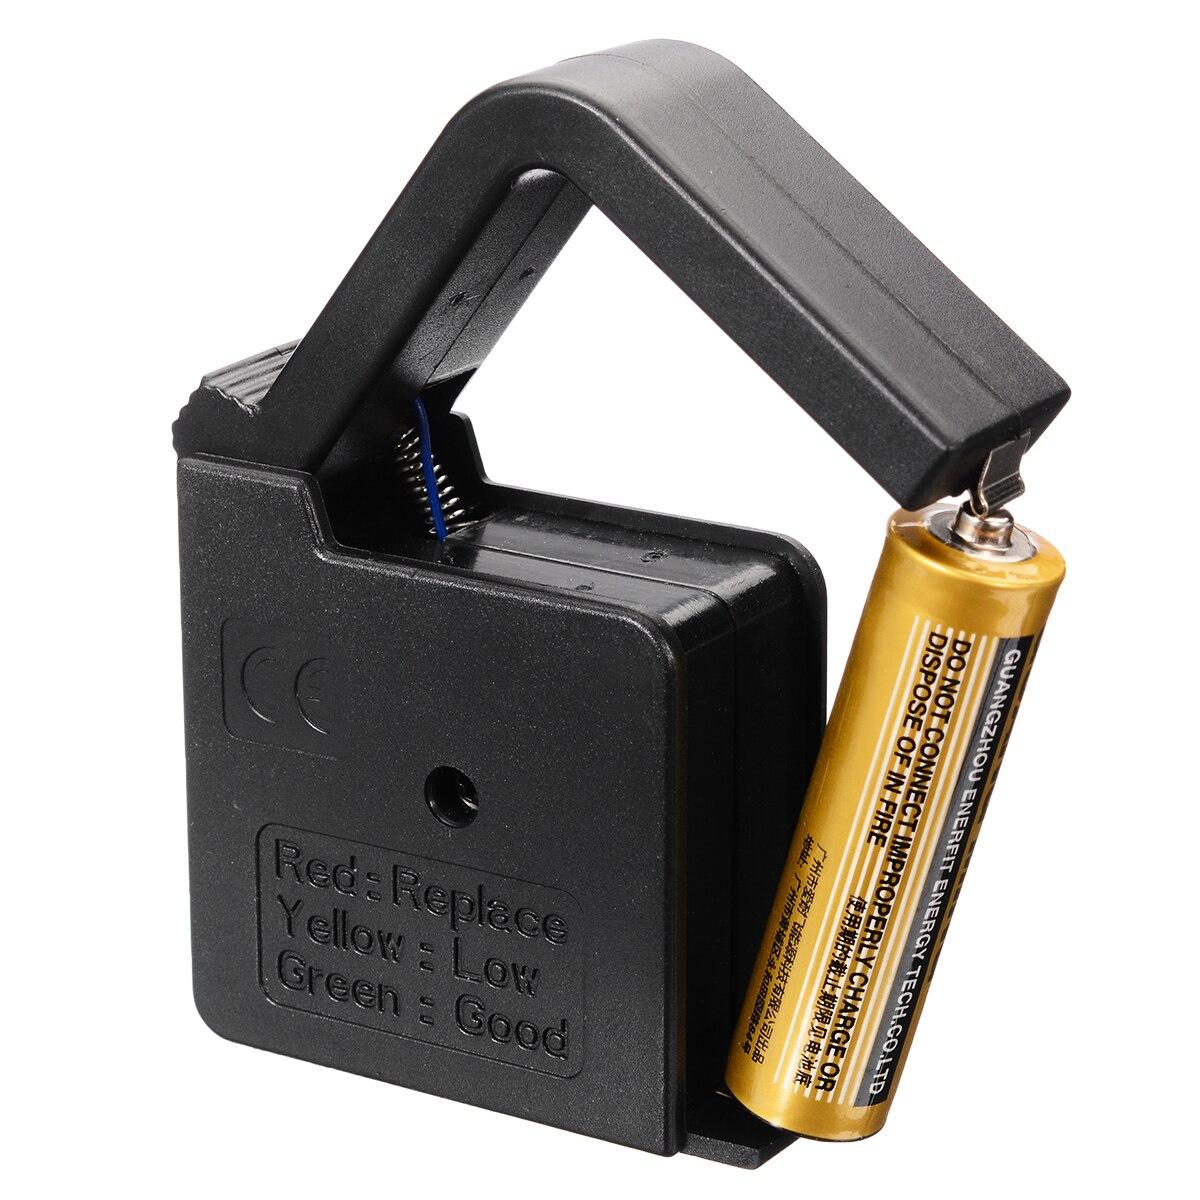 Цифровой тестер напряжения батареи проверка для AA/AAA/C/D/18650/9 V/1,5 V кнопочный прибор для измерения заряда батареи